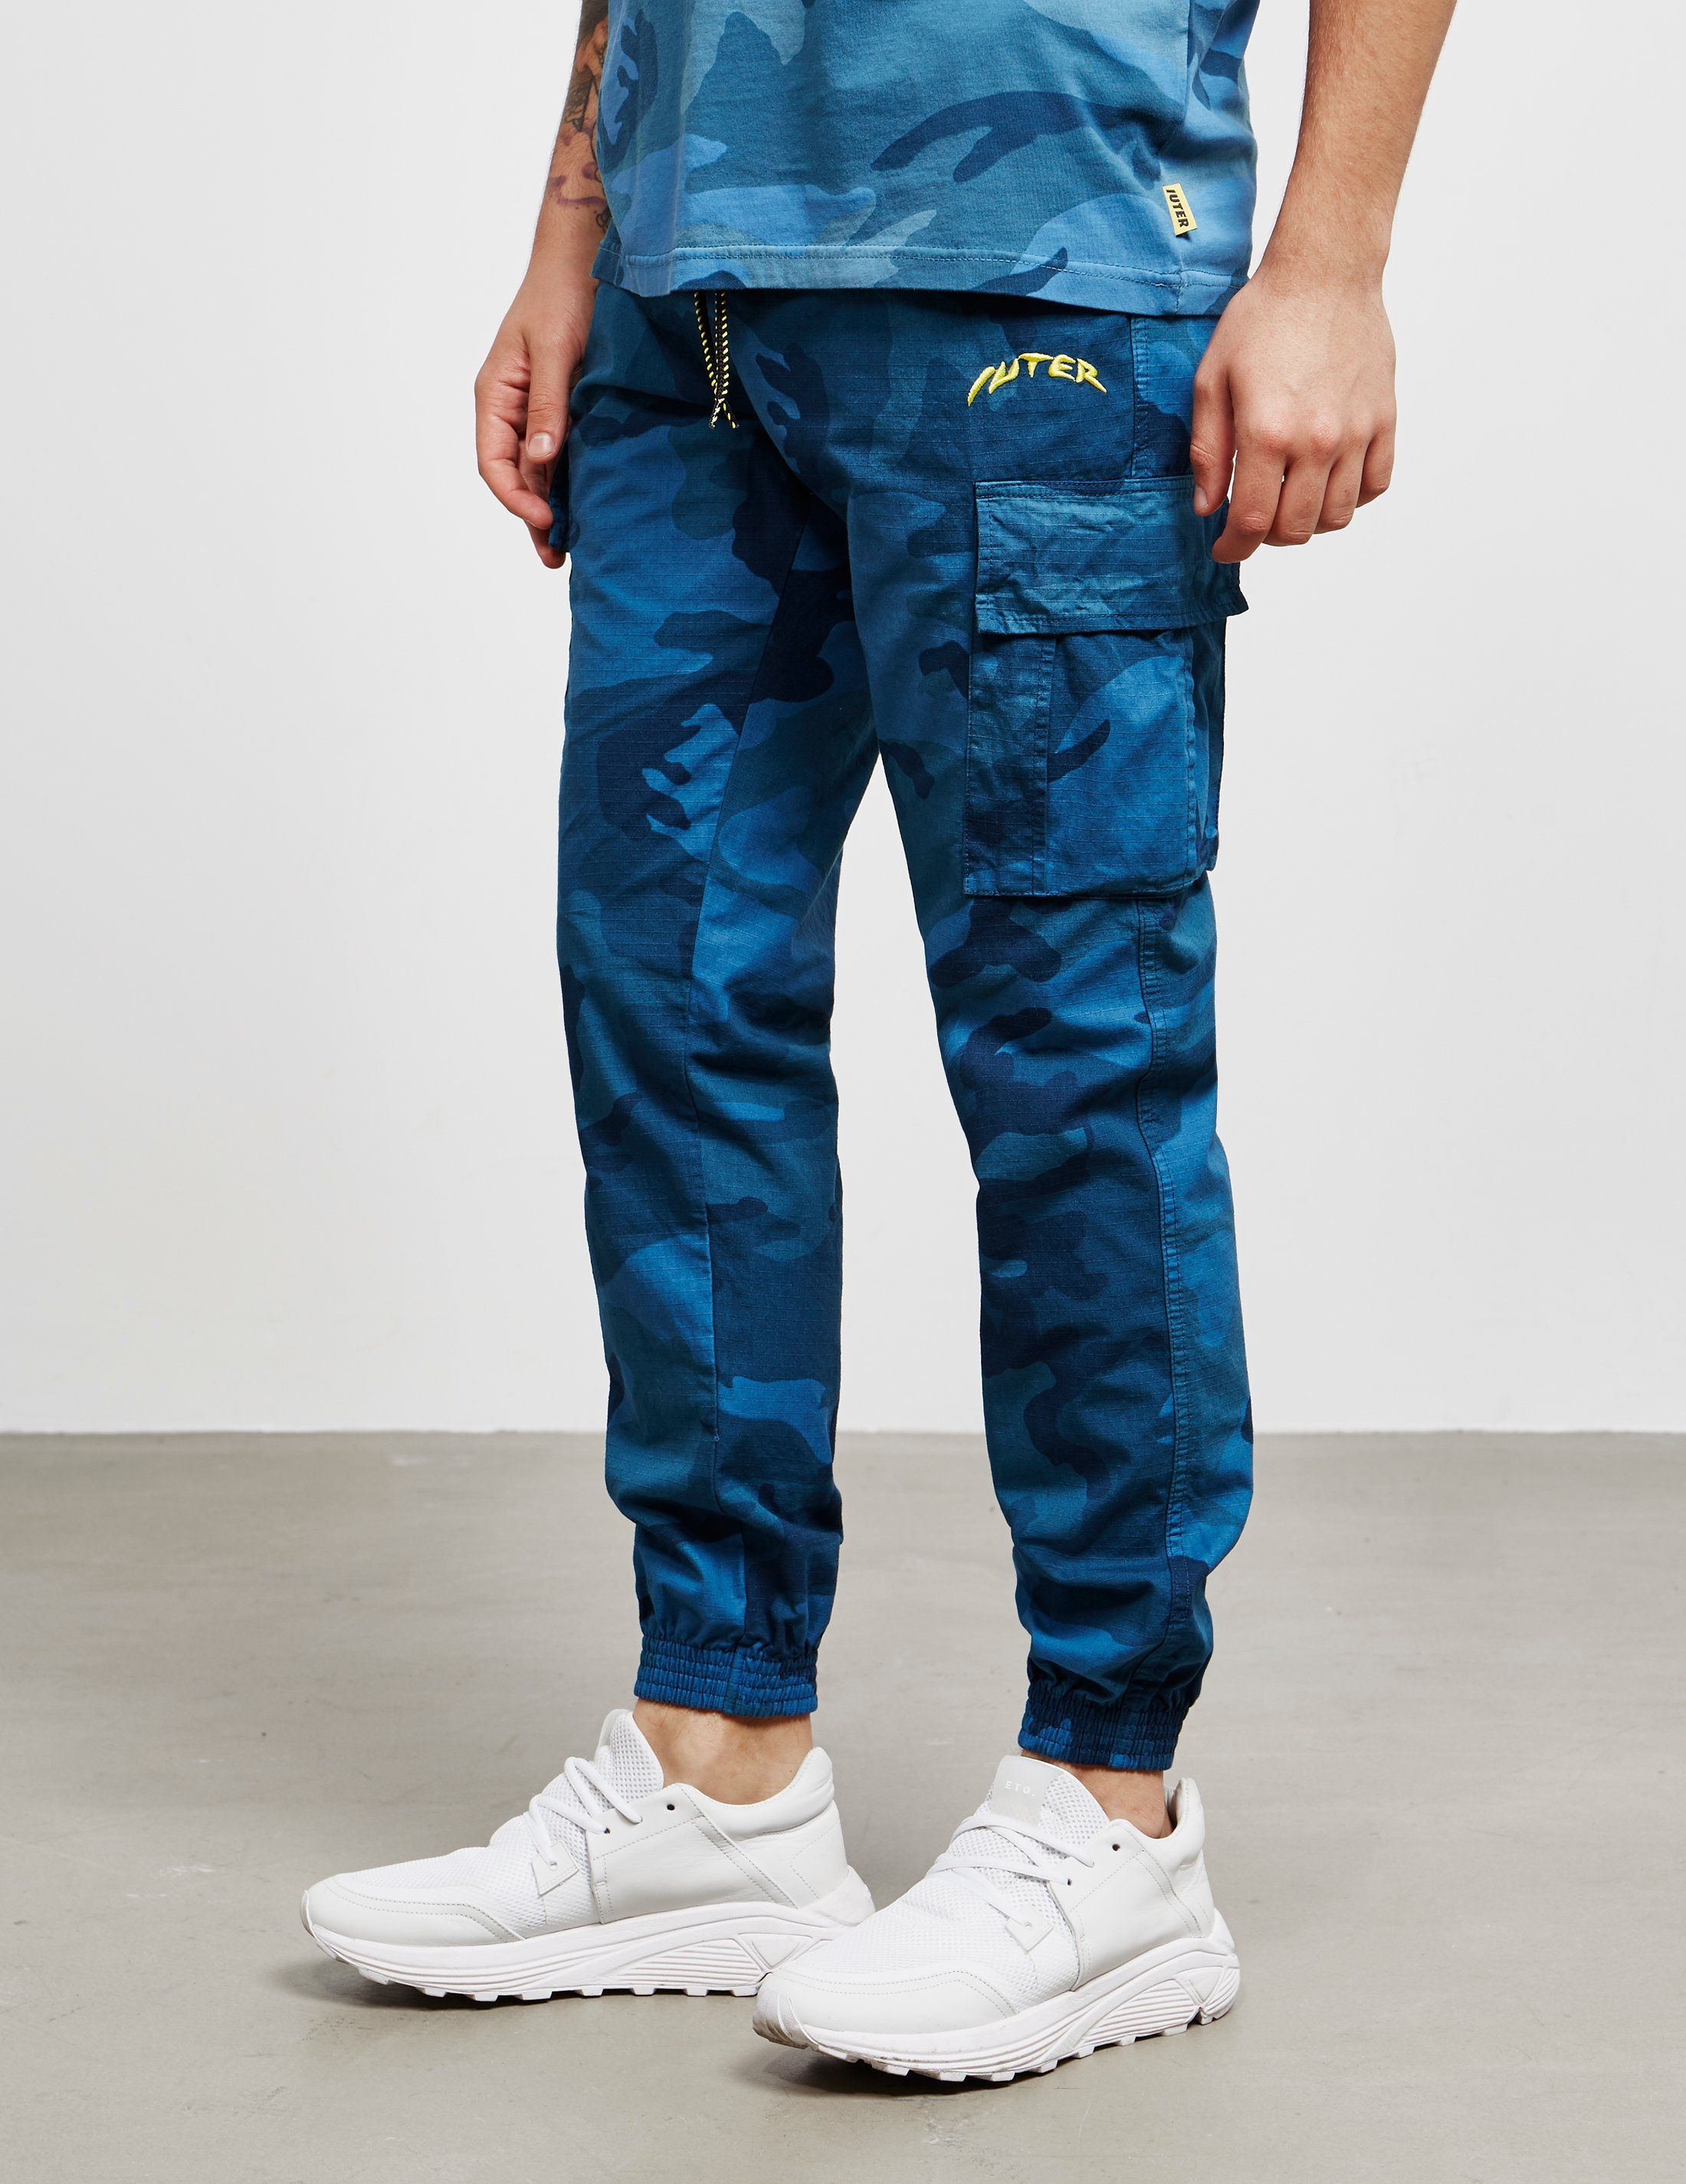 IUTER Camouflage Track Pants